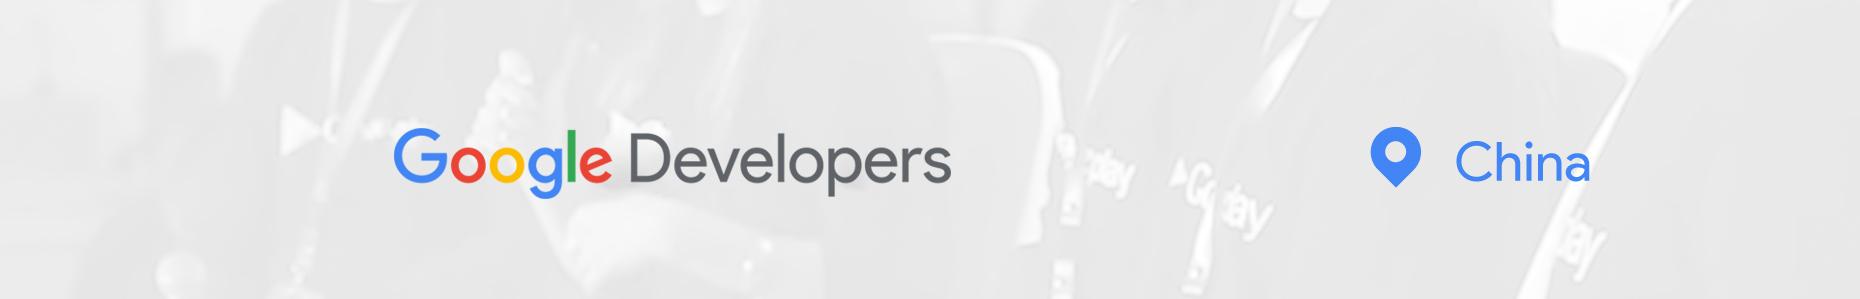 Google开发者 banner